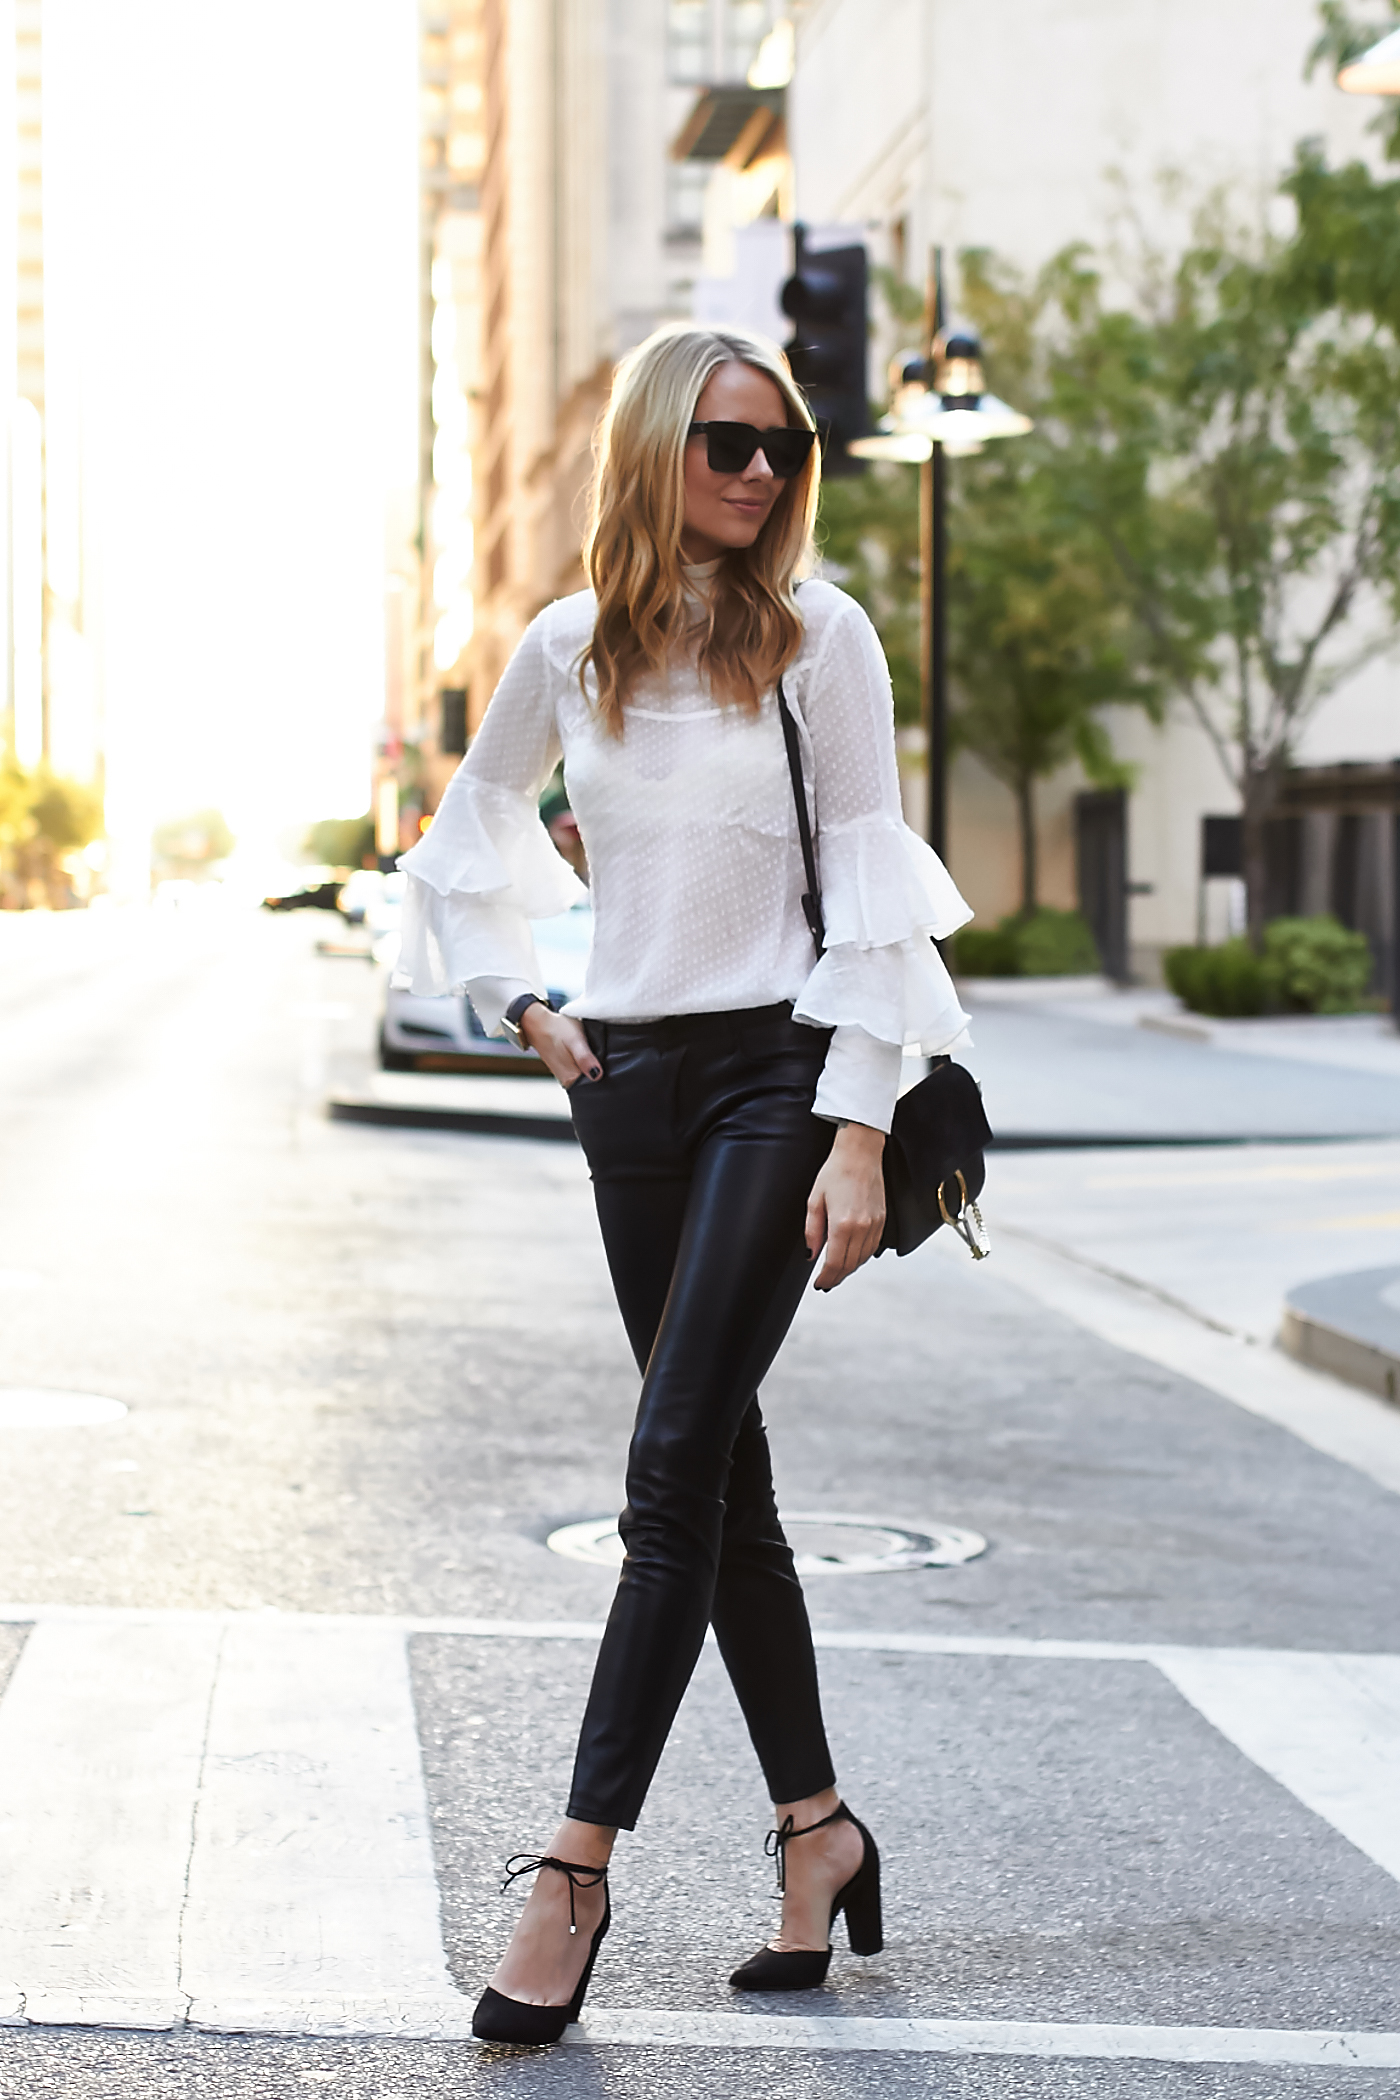 fashion-jackson-black-faux-leather-pants-white-ruffle-sleeve-blouse-black-bow-pumps